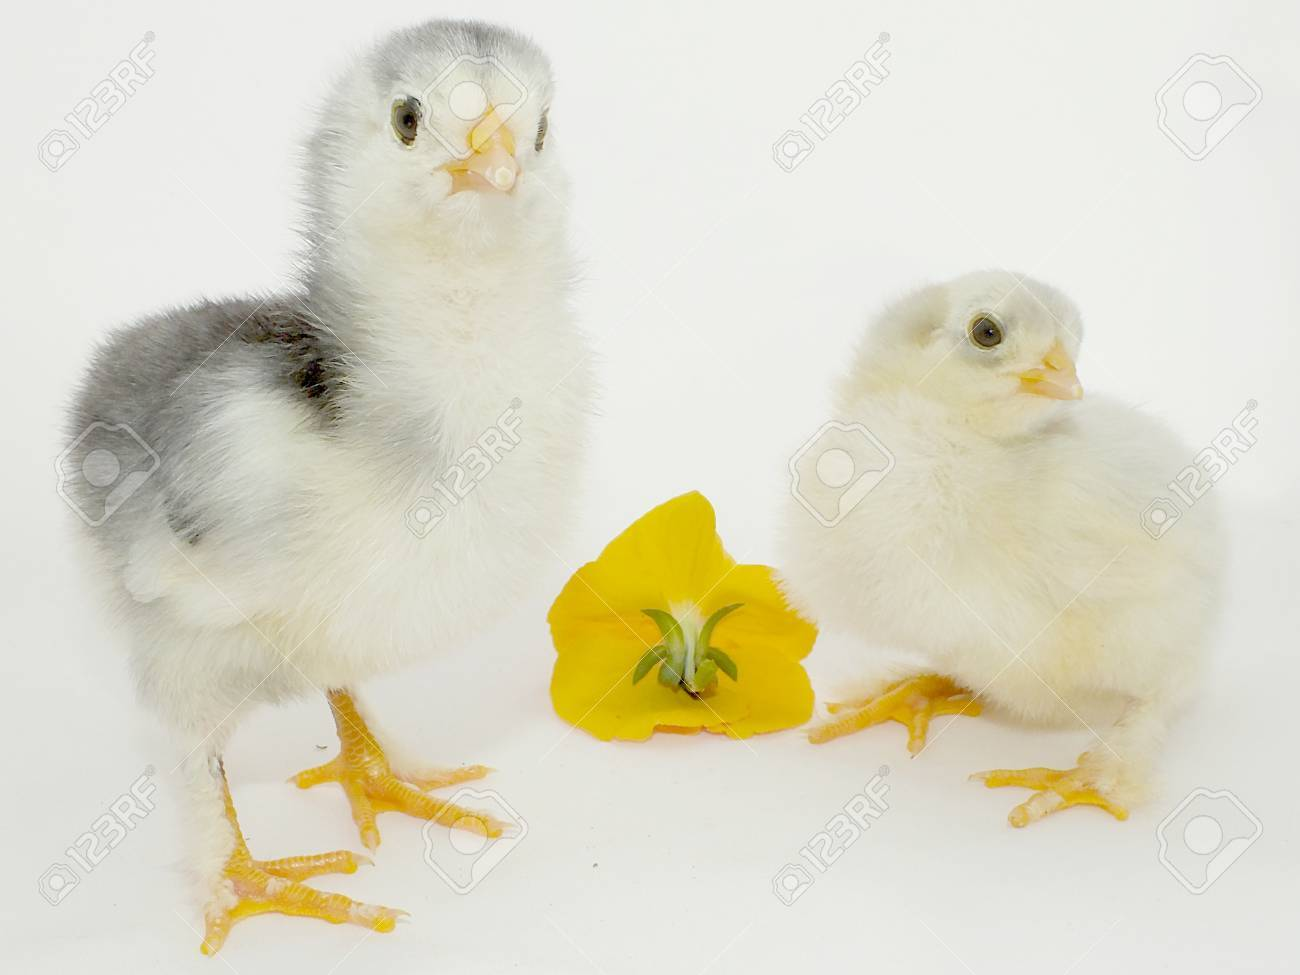 new born cute, fluffy little chicken chick Stock Photo - 13623509